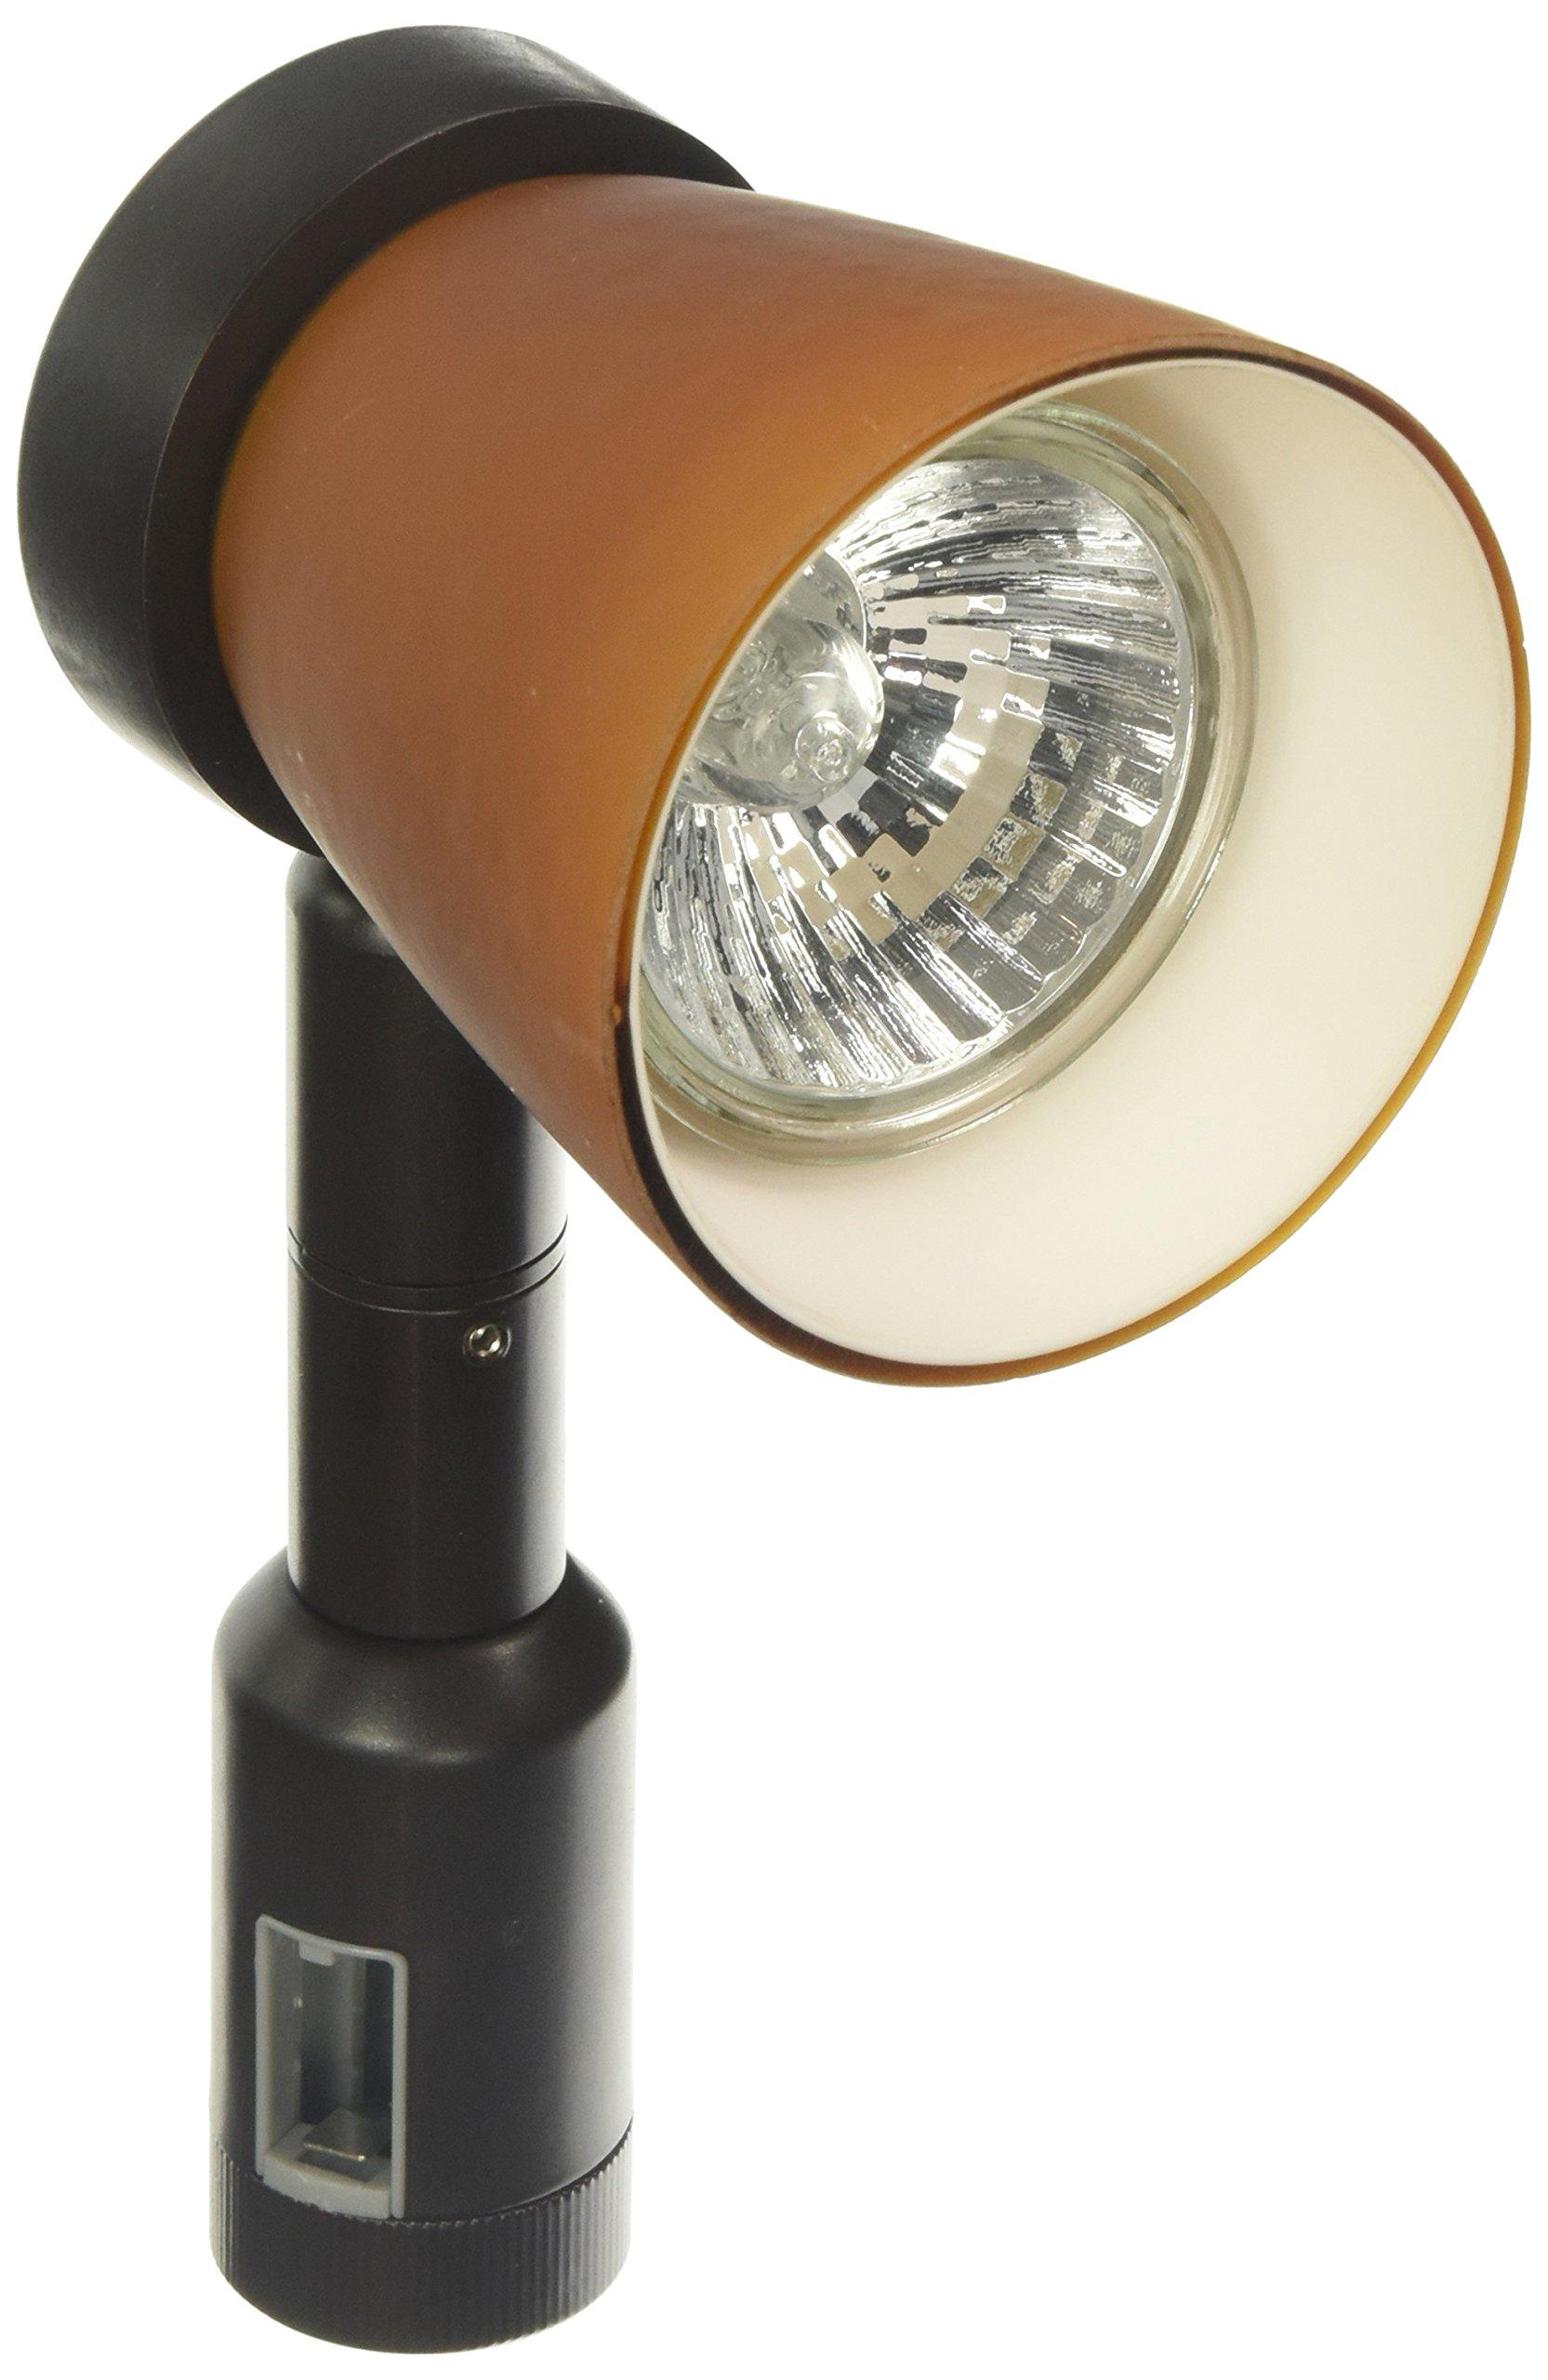 WAC Lighting HM1-101-AM/DB Gu10 Hm1 Fixture